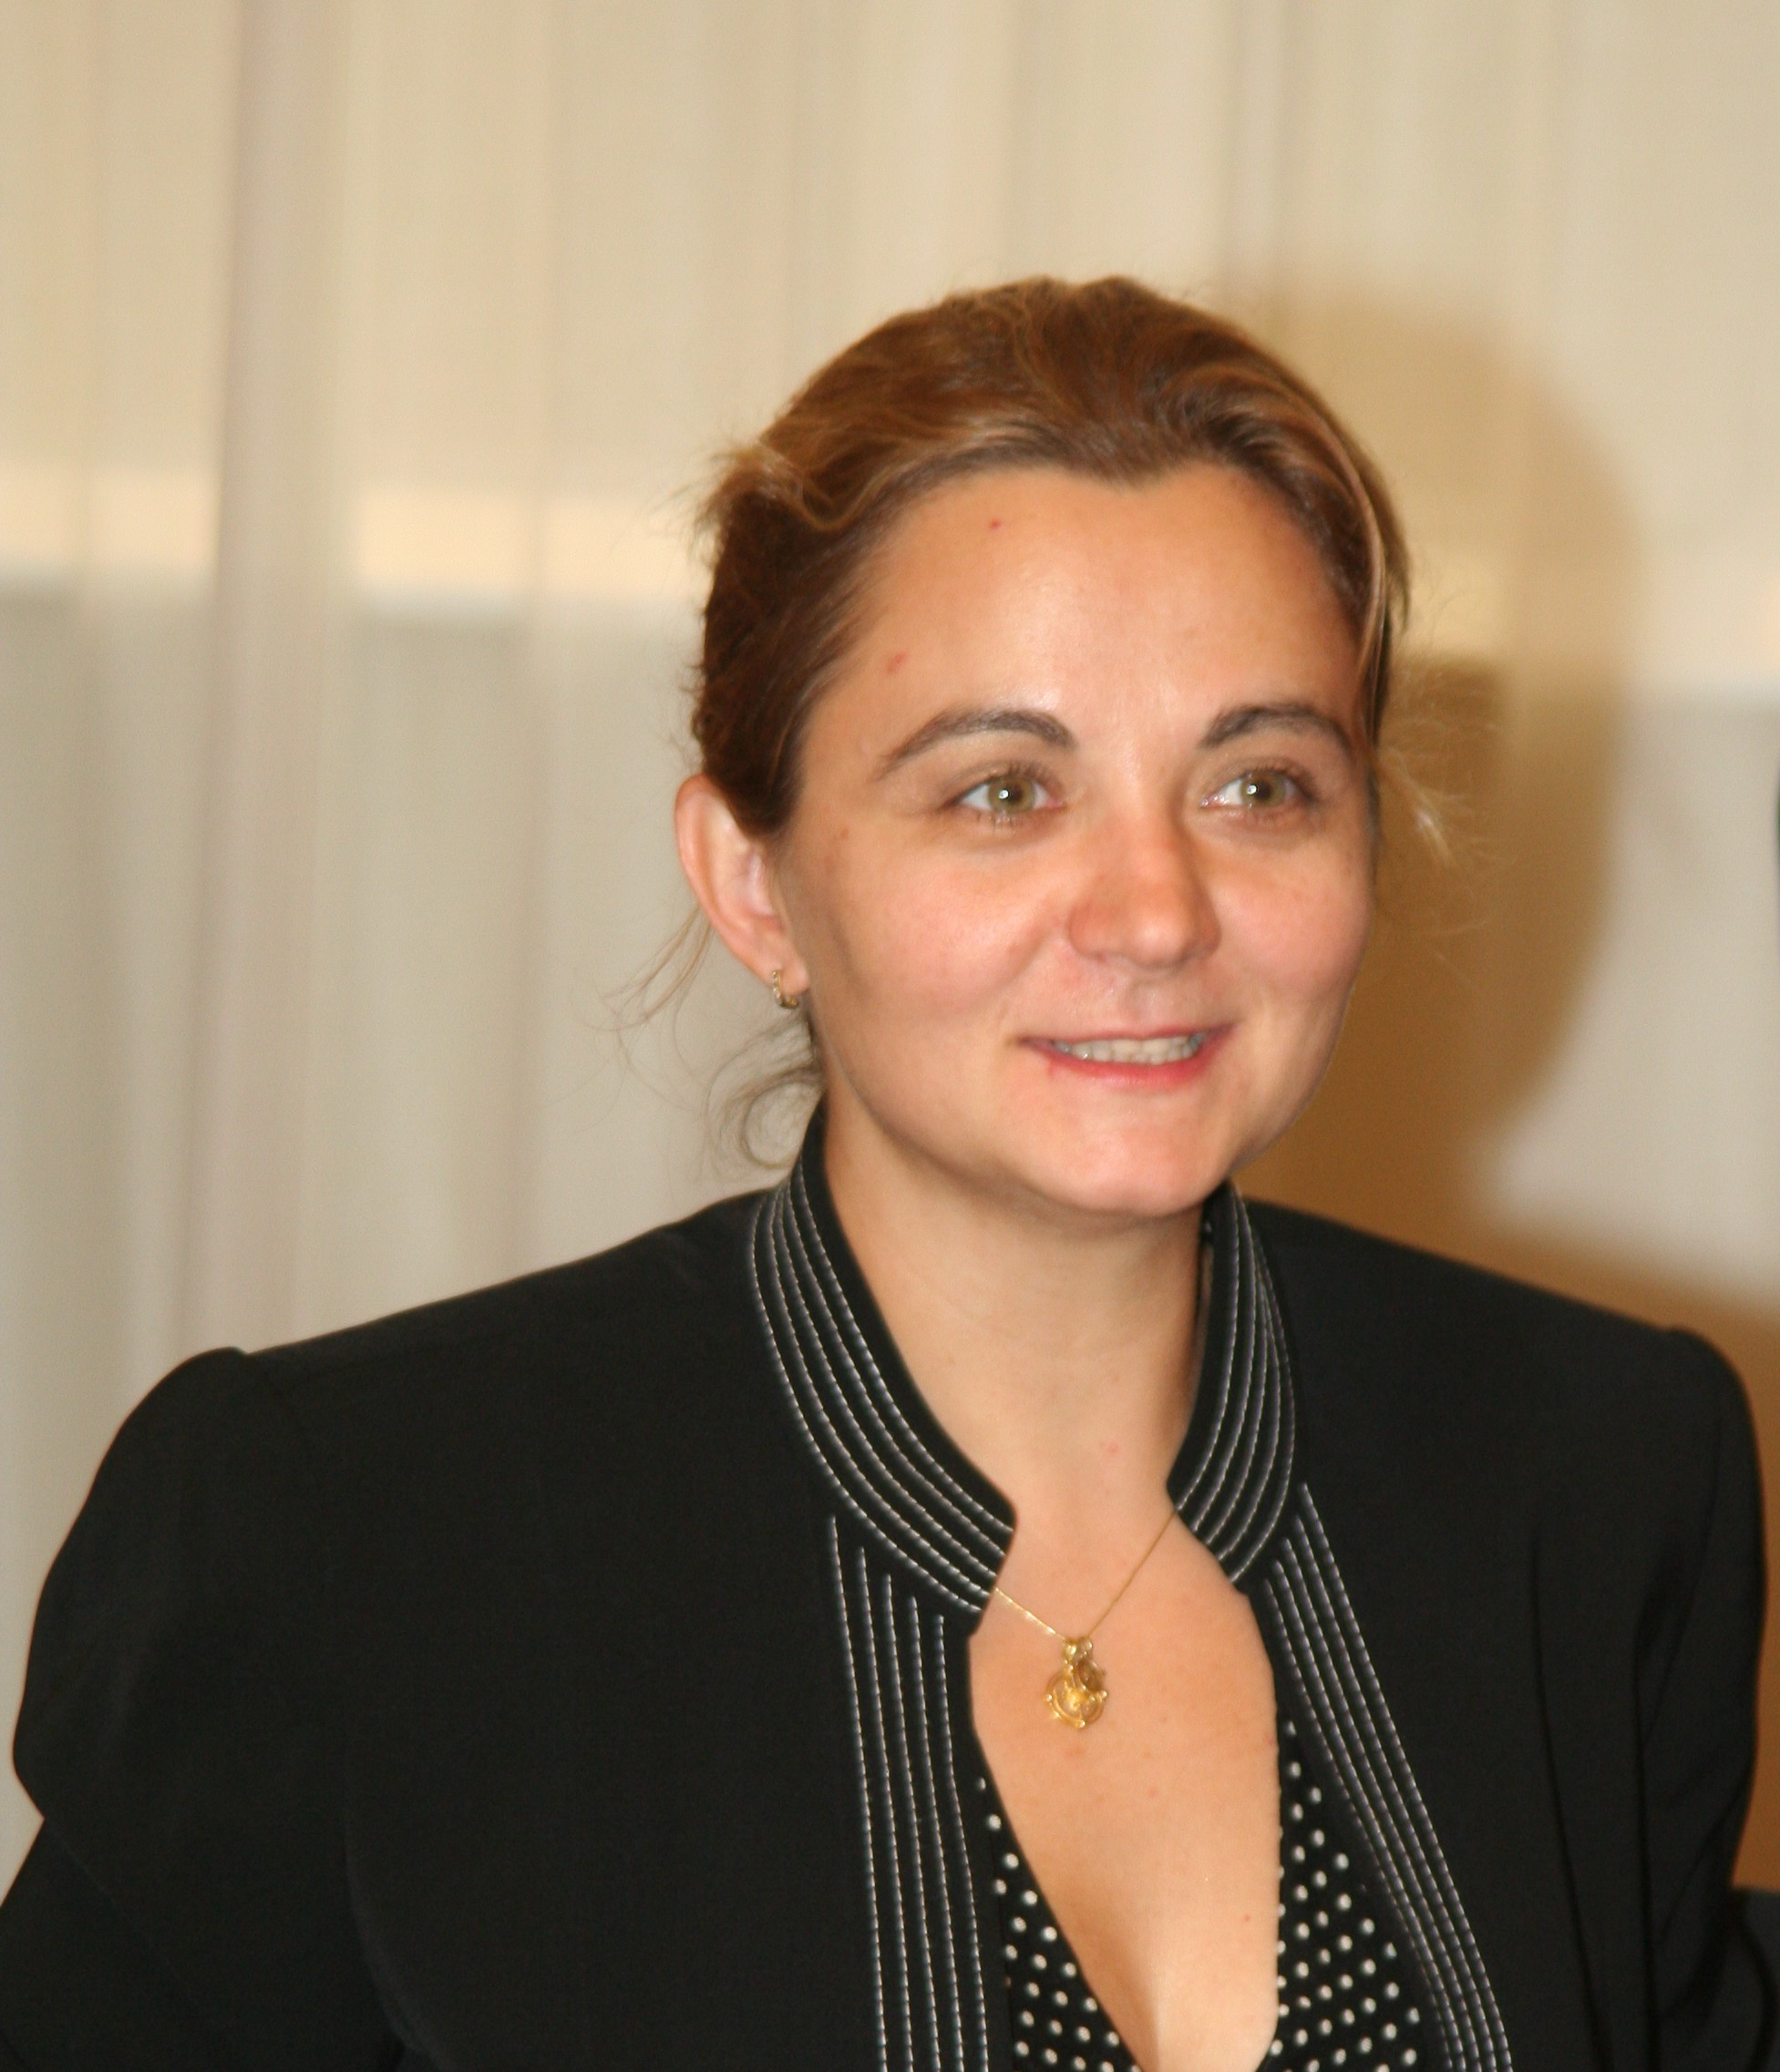 Iuliana Ceausu